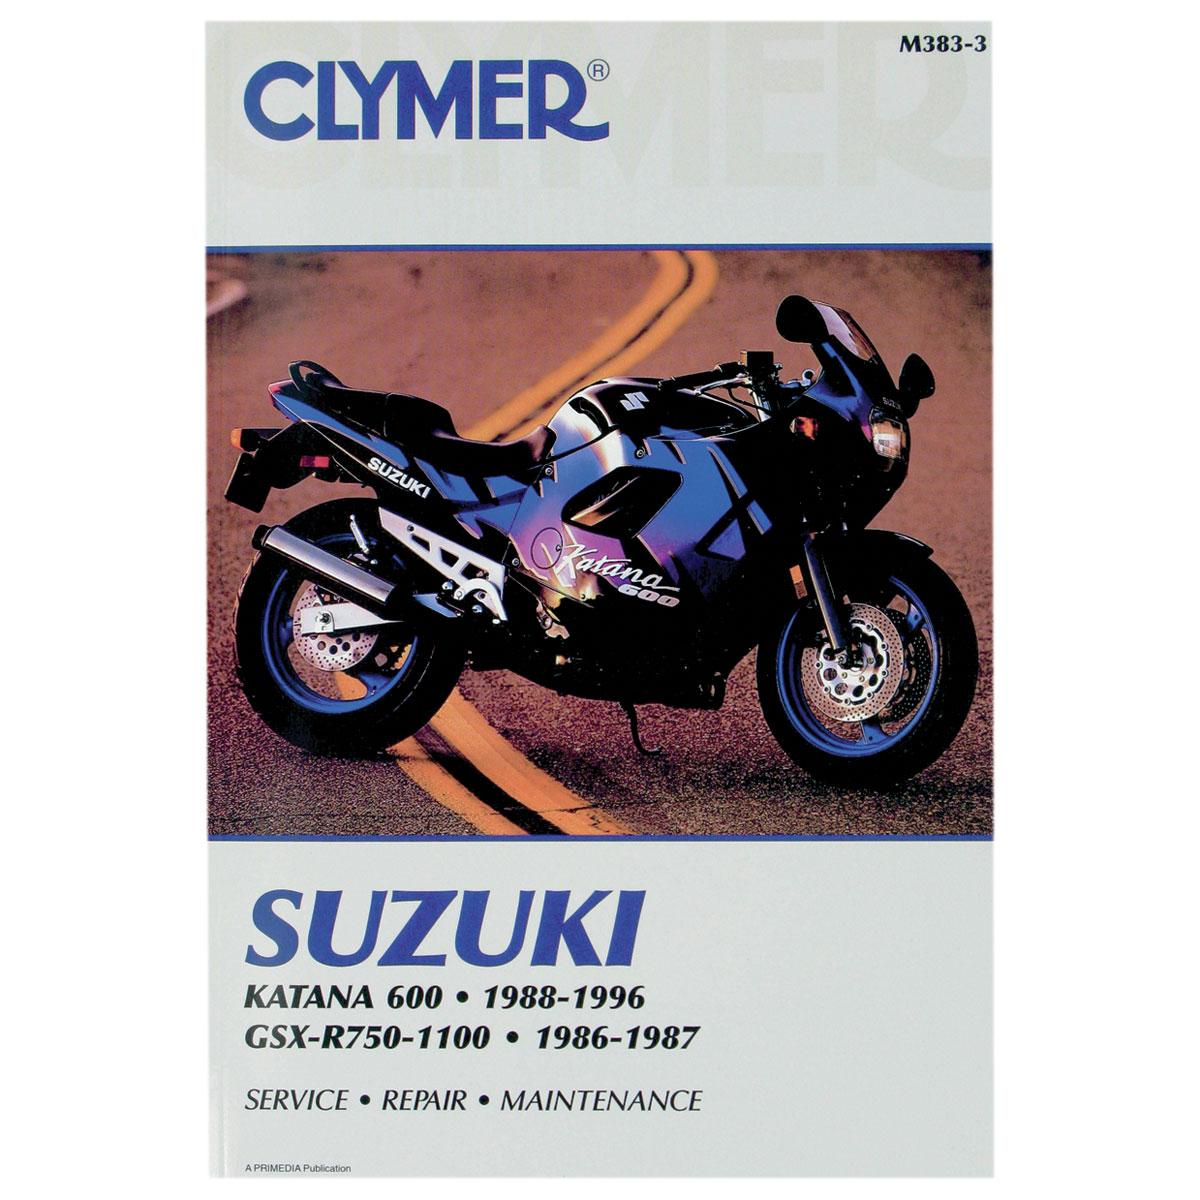 clymer suzuki motorcycle repair manual 181 2319 j p cycles rh jpcycles com suzuki motorcycles service manual suzuki motorcycle service manual pdf